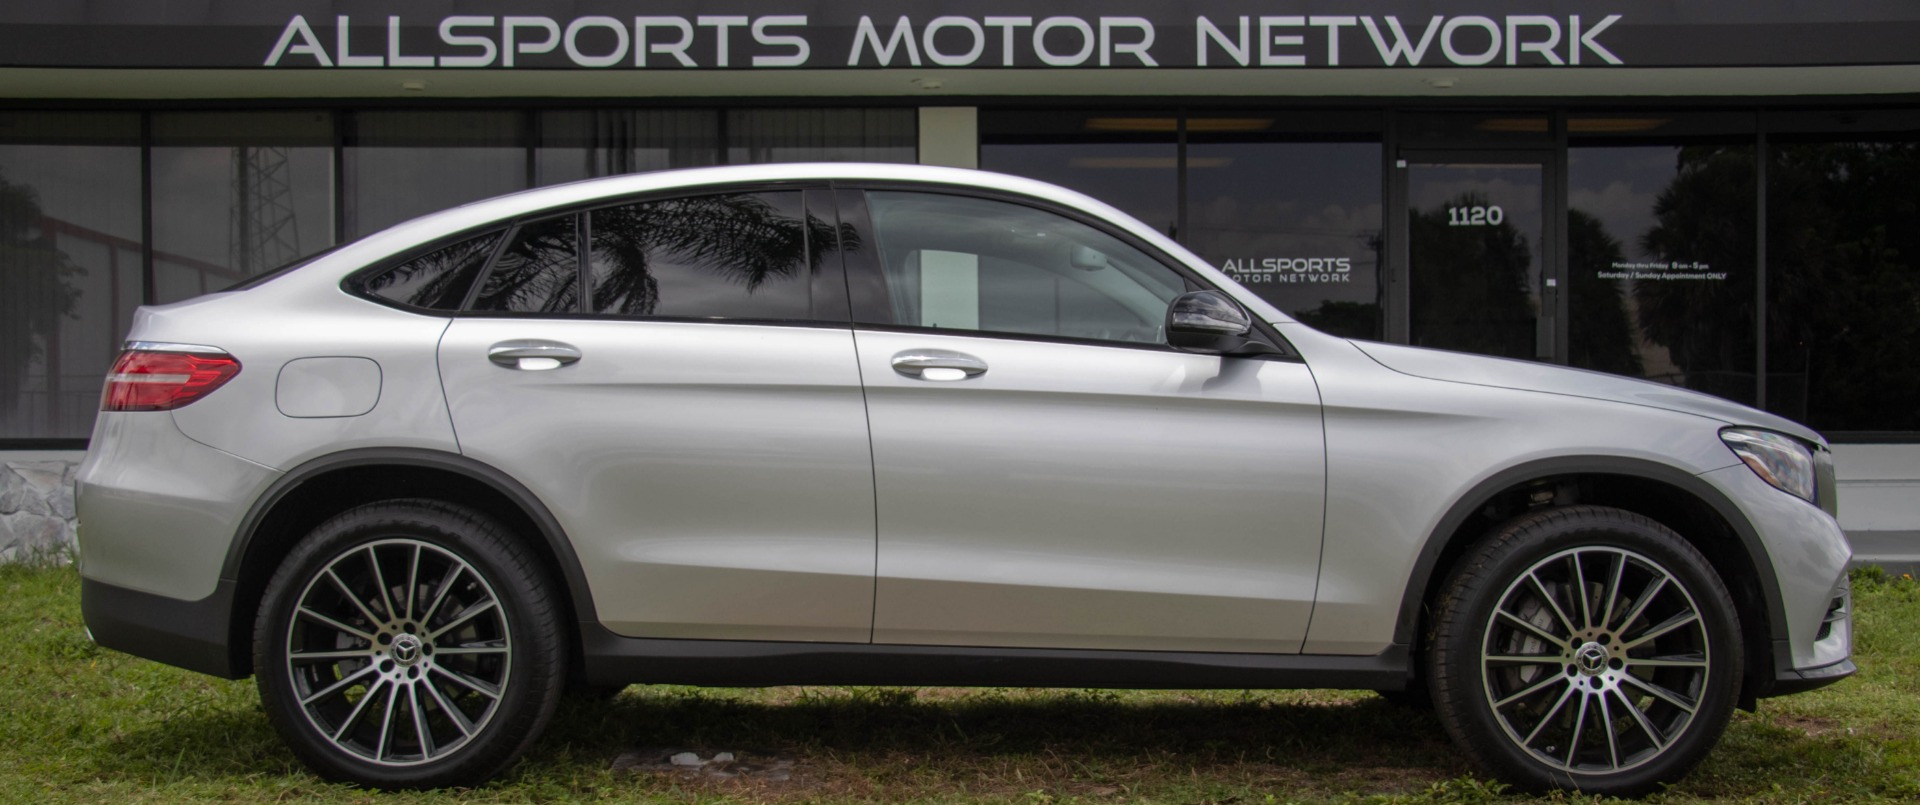 Used 2017 Mercedes-Benz GLC Coupe AMG Sport Pkg. GLC 300 4MATIC | Miami, FL